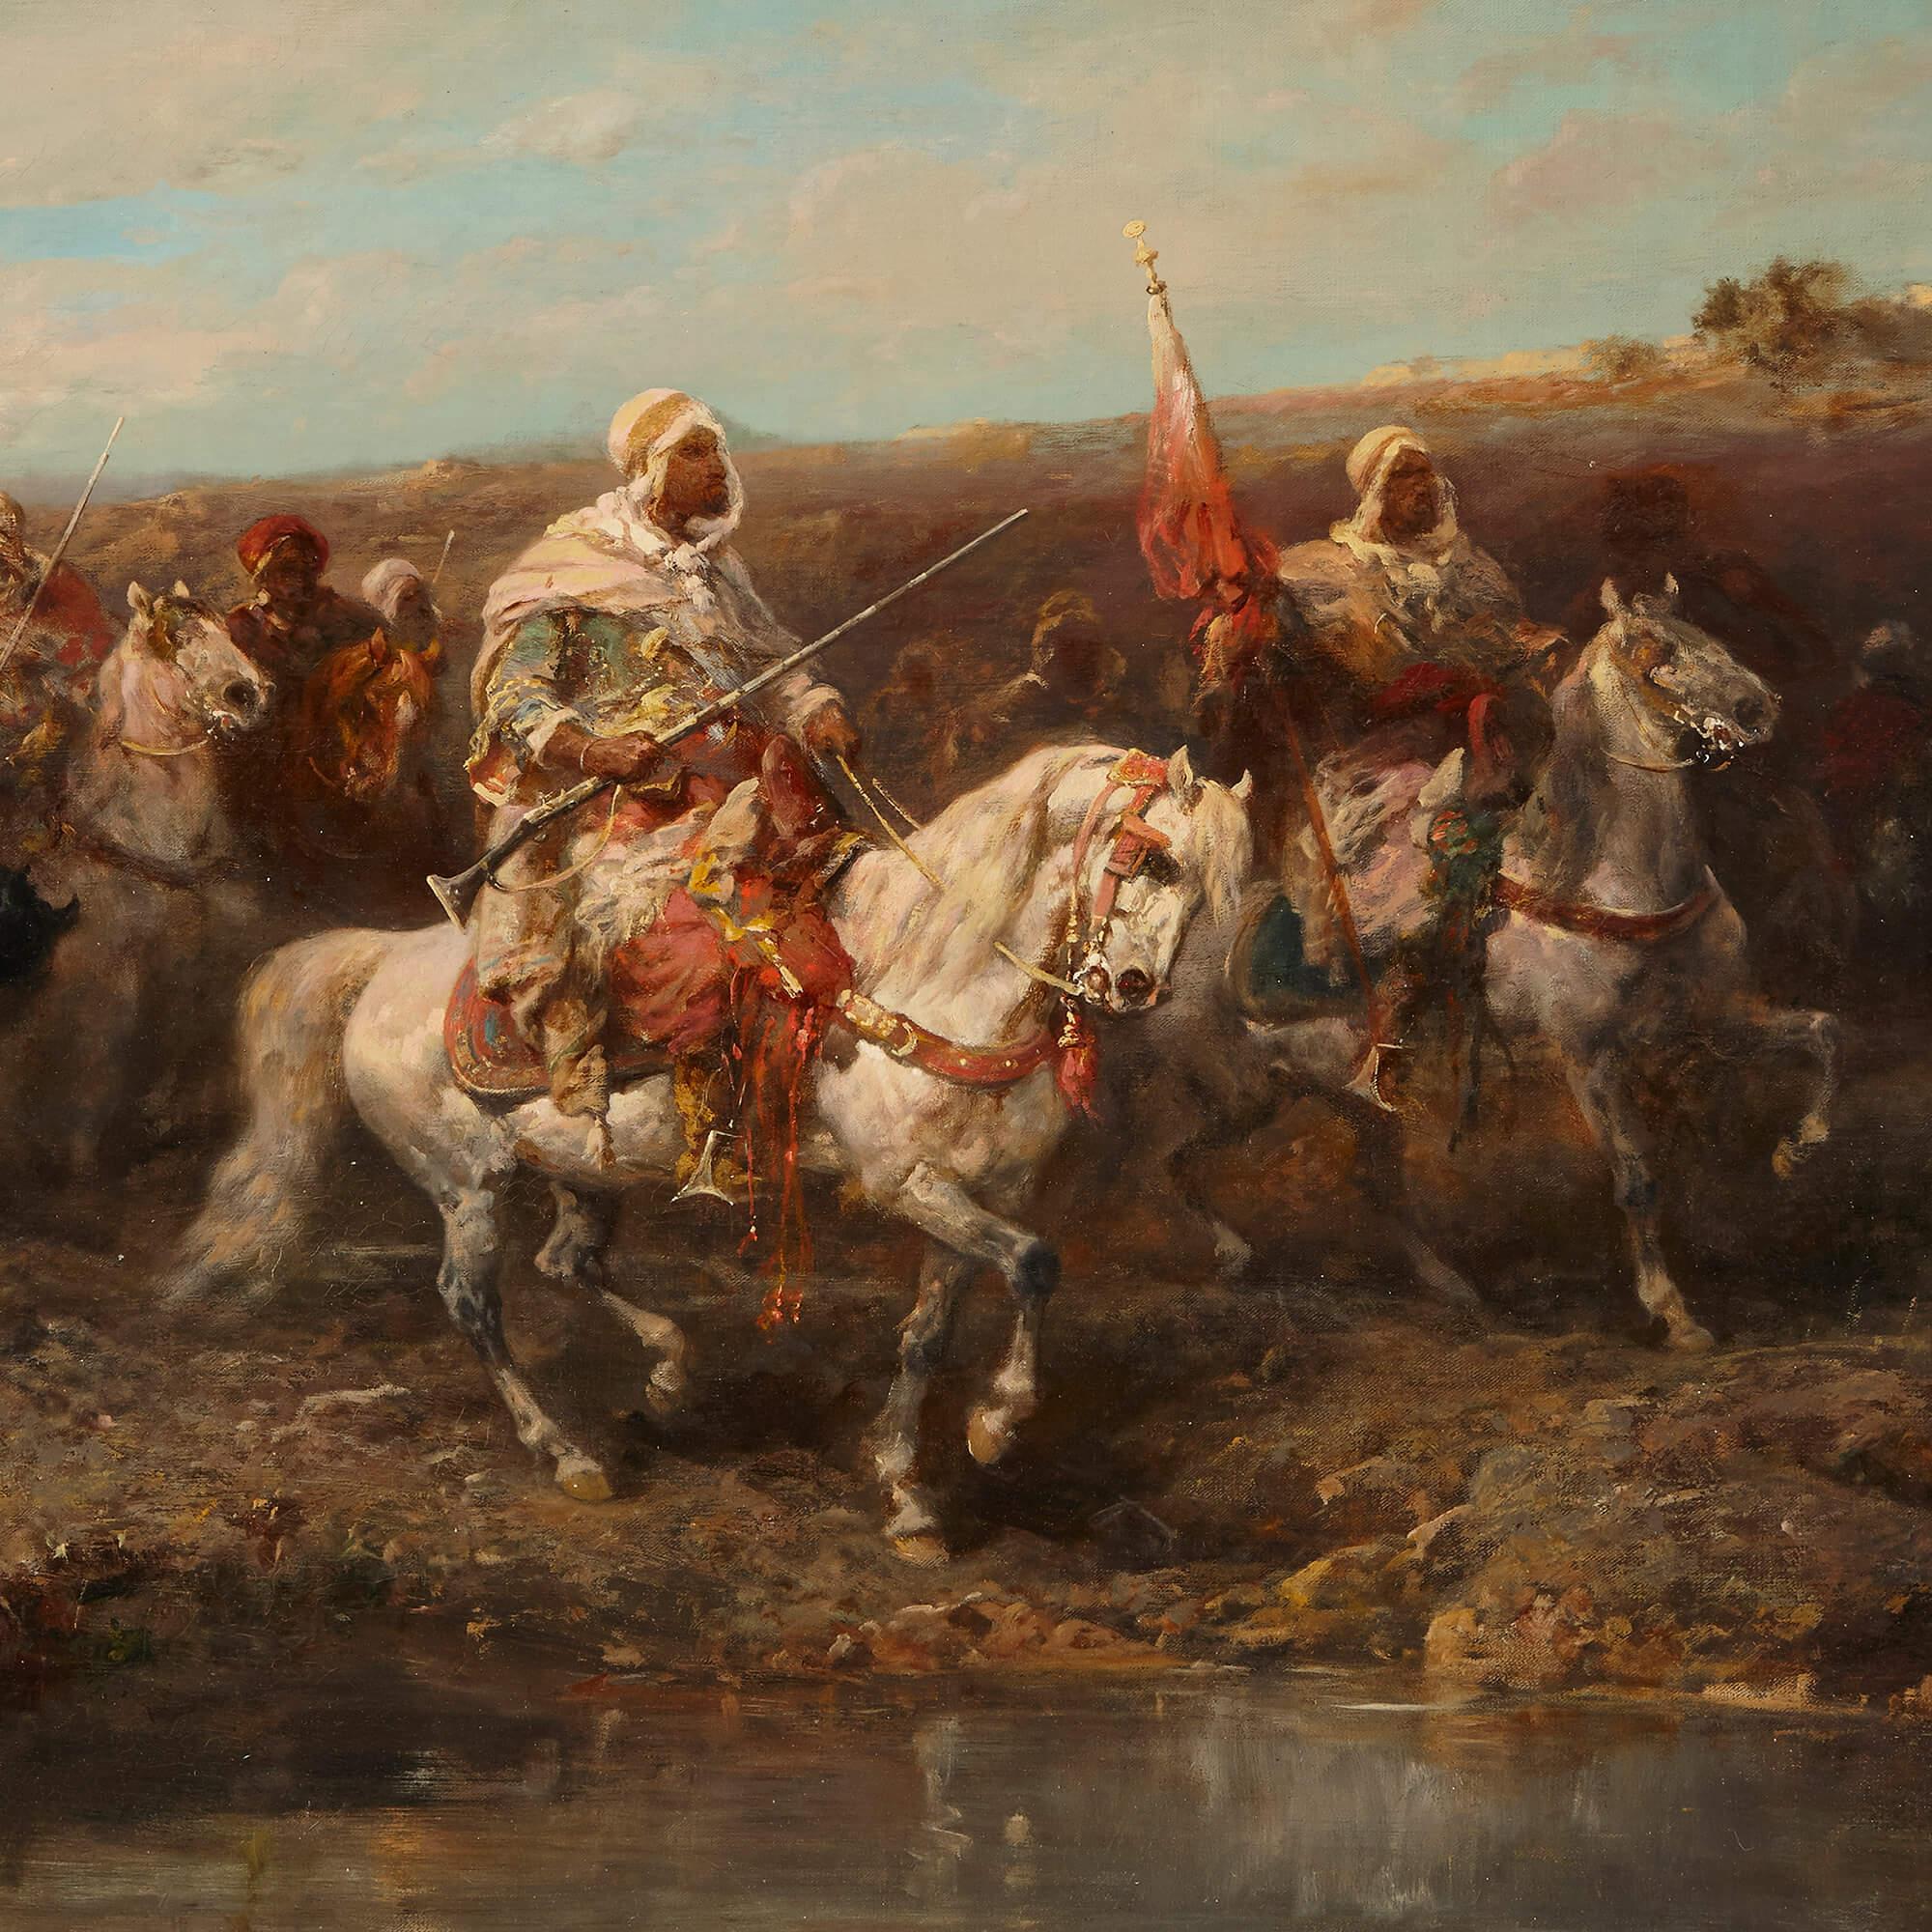 Arabian Horsemen Orientalist Painting By Schreyer Mayfair Gallery